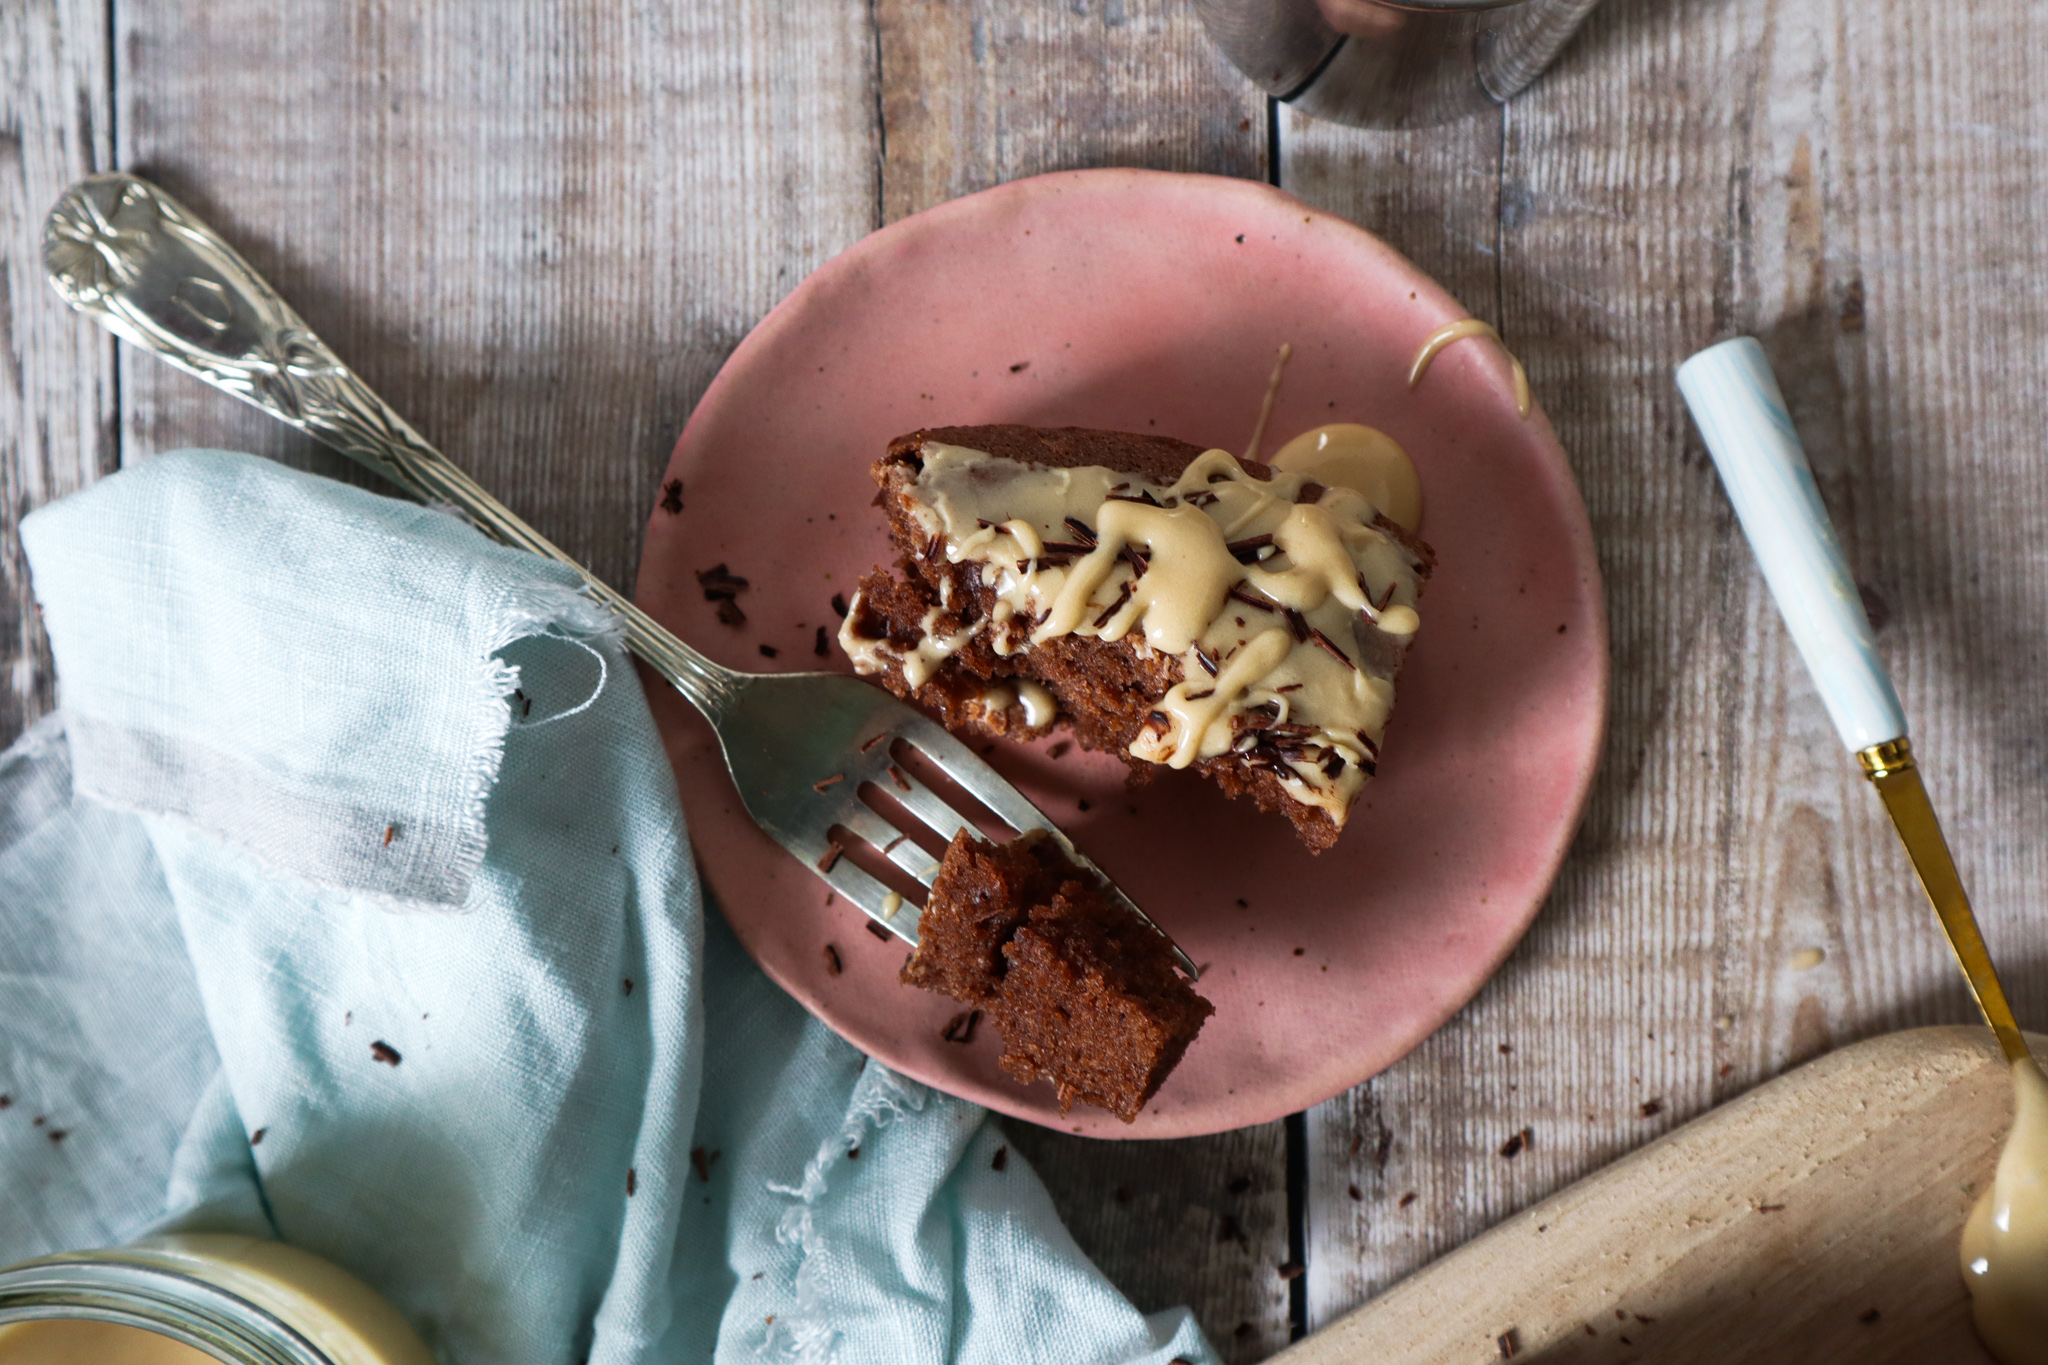 Chocolate cake with espresso glaze